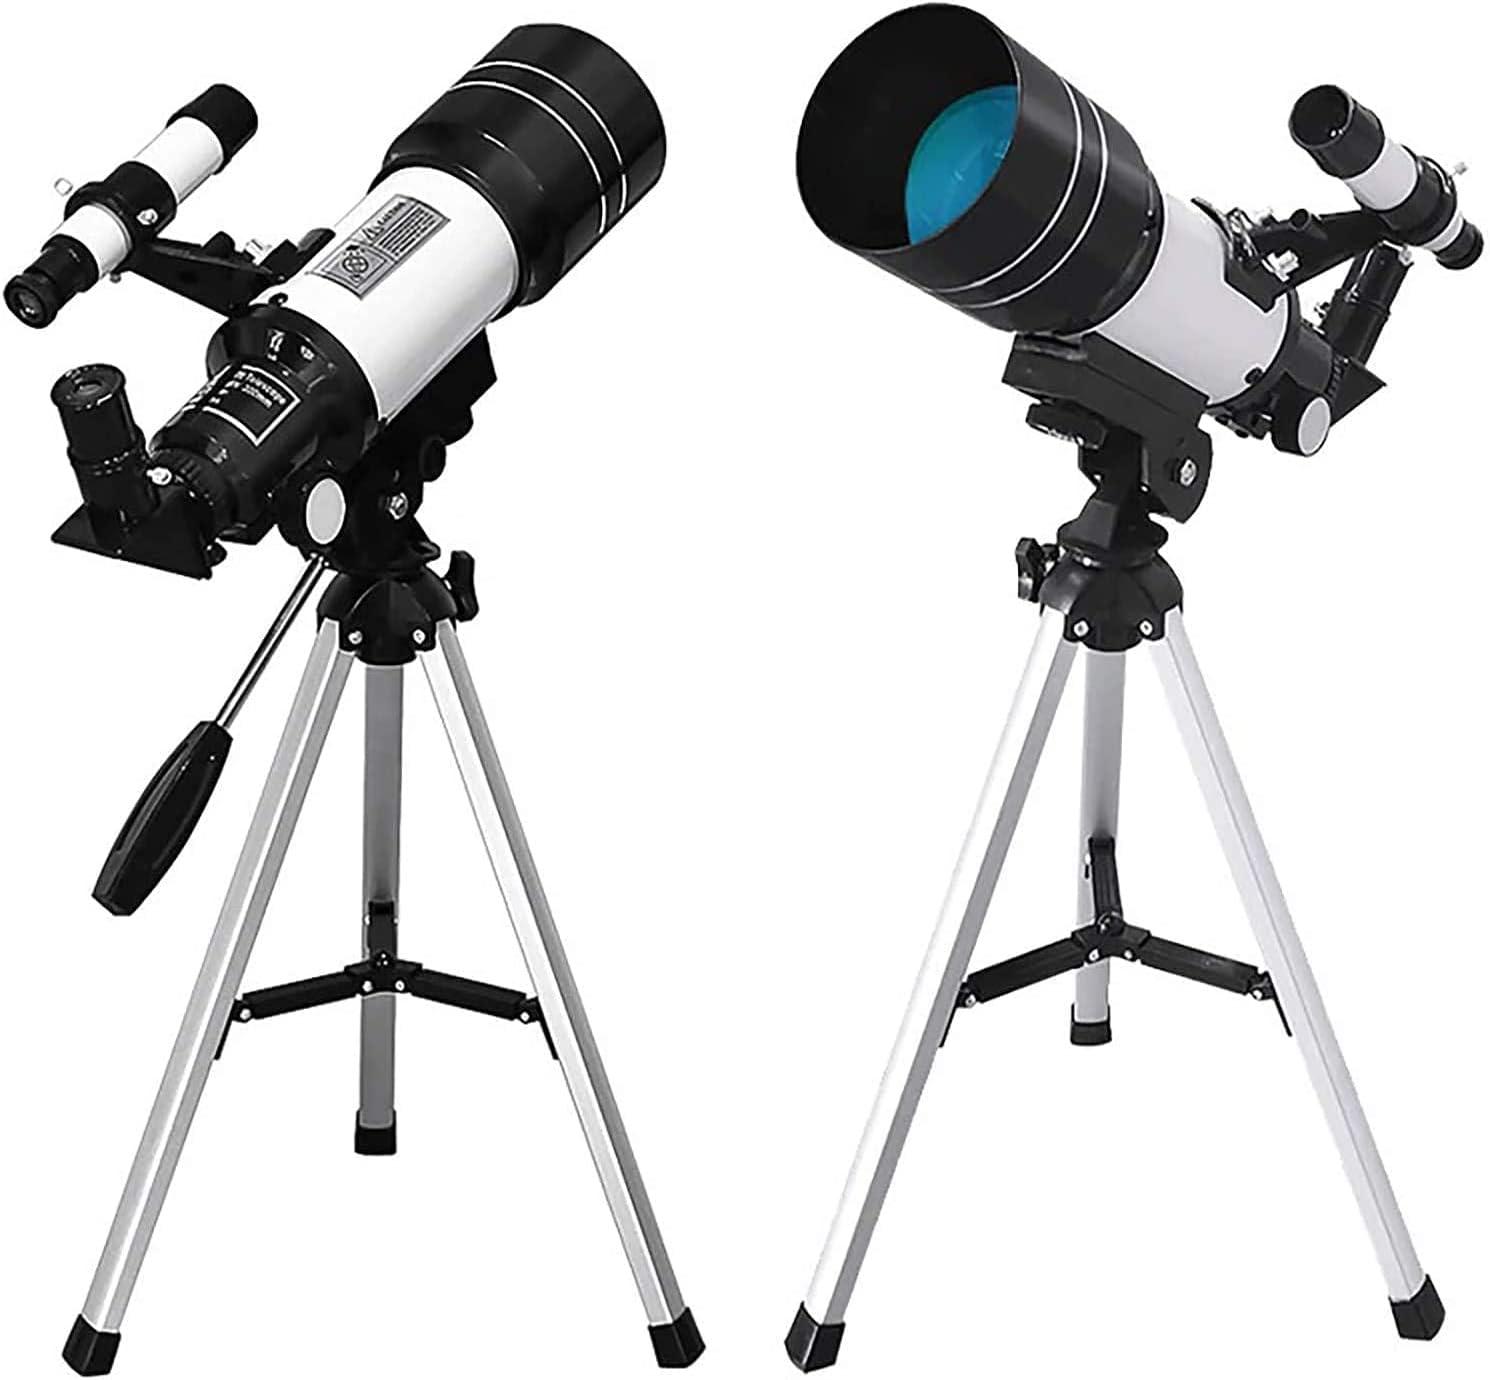 Diumy Kids Astronomical Telescope NEW National uniform free shipping Telesc Refractor 70mm Aperture